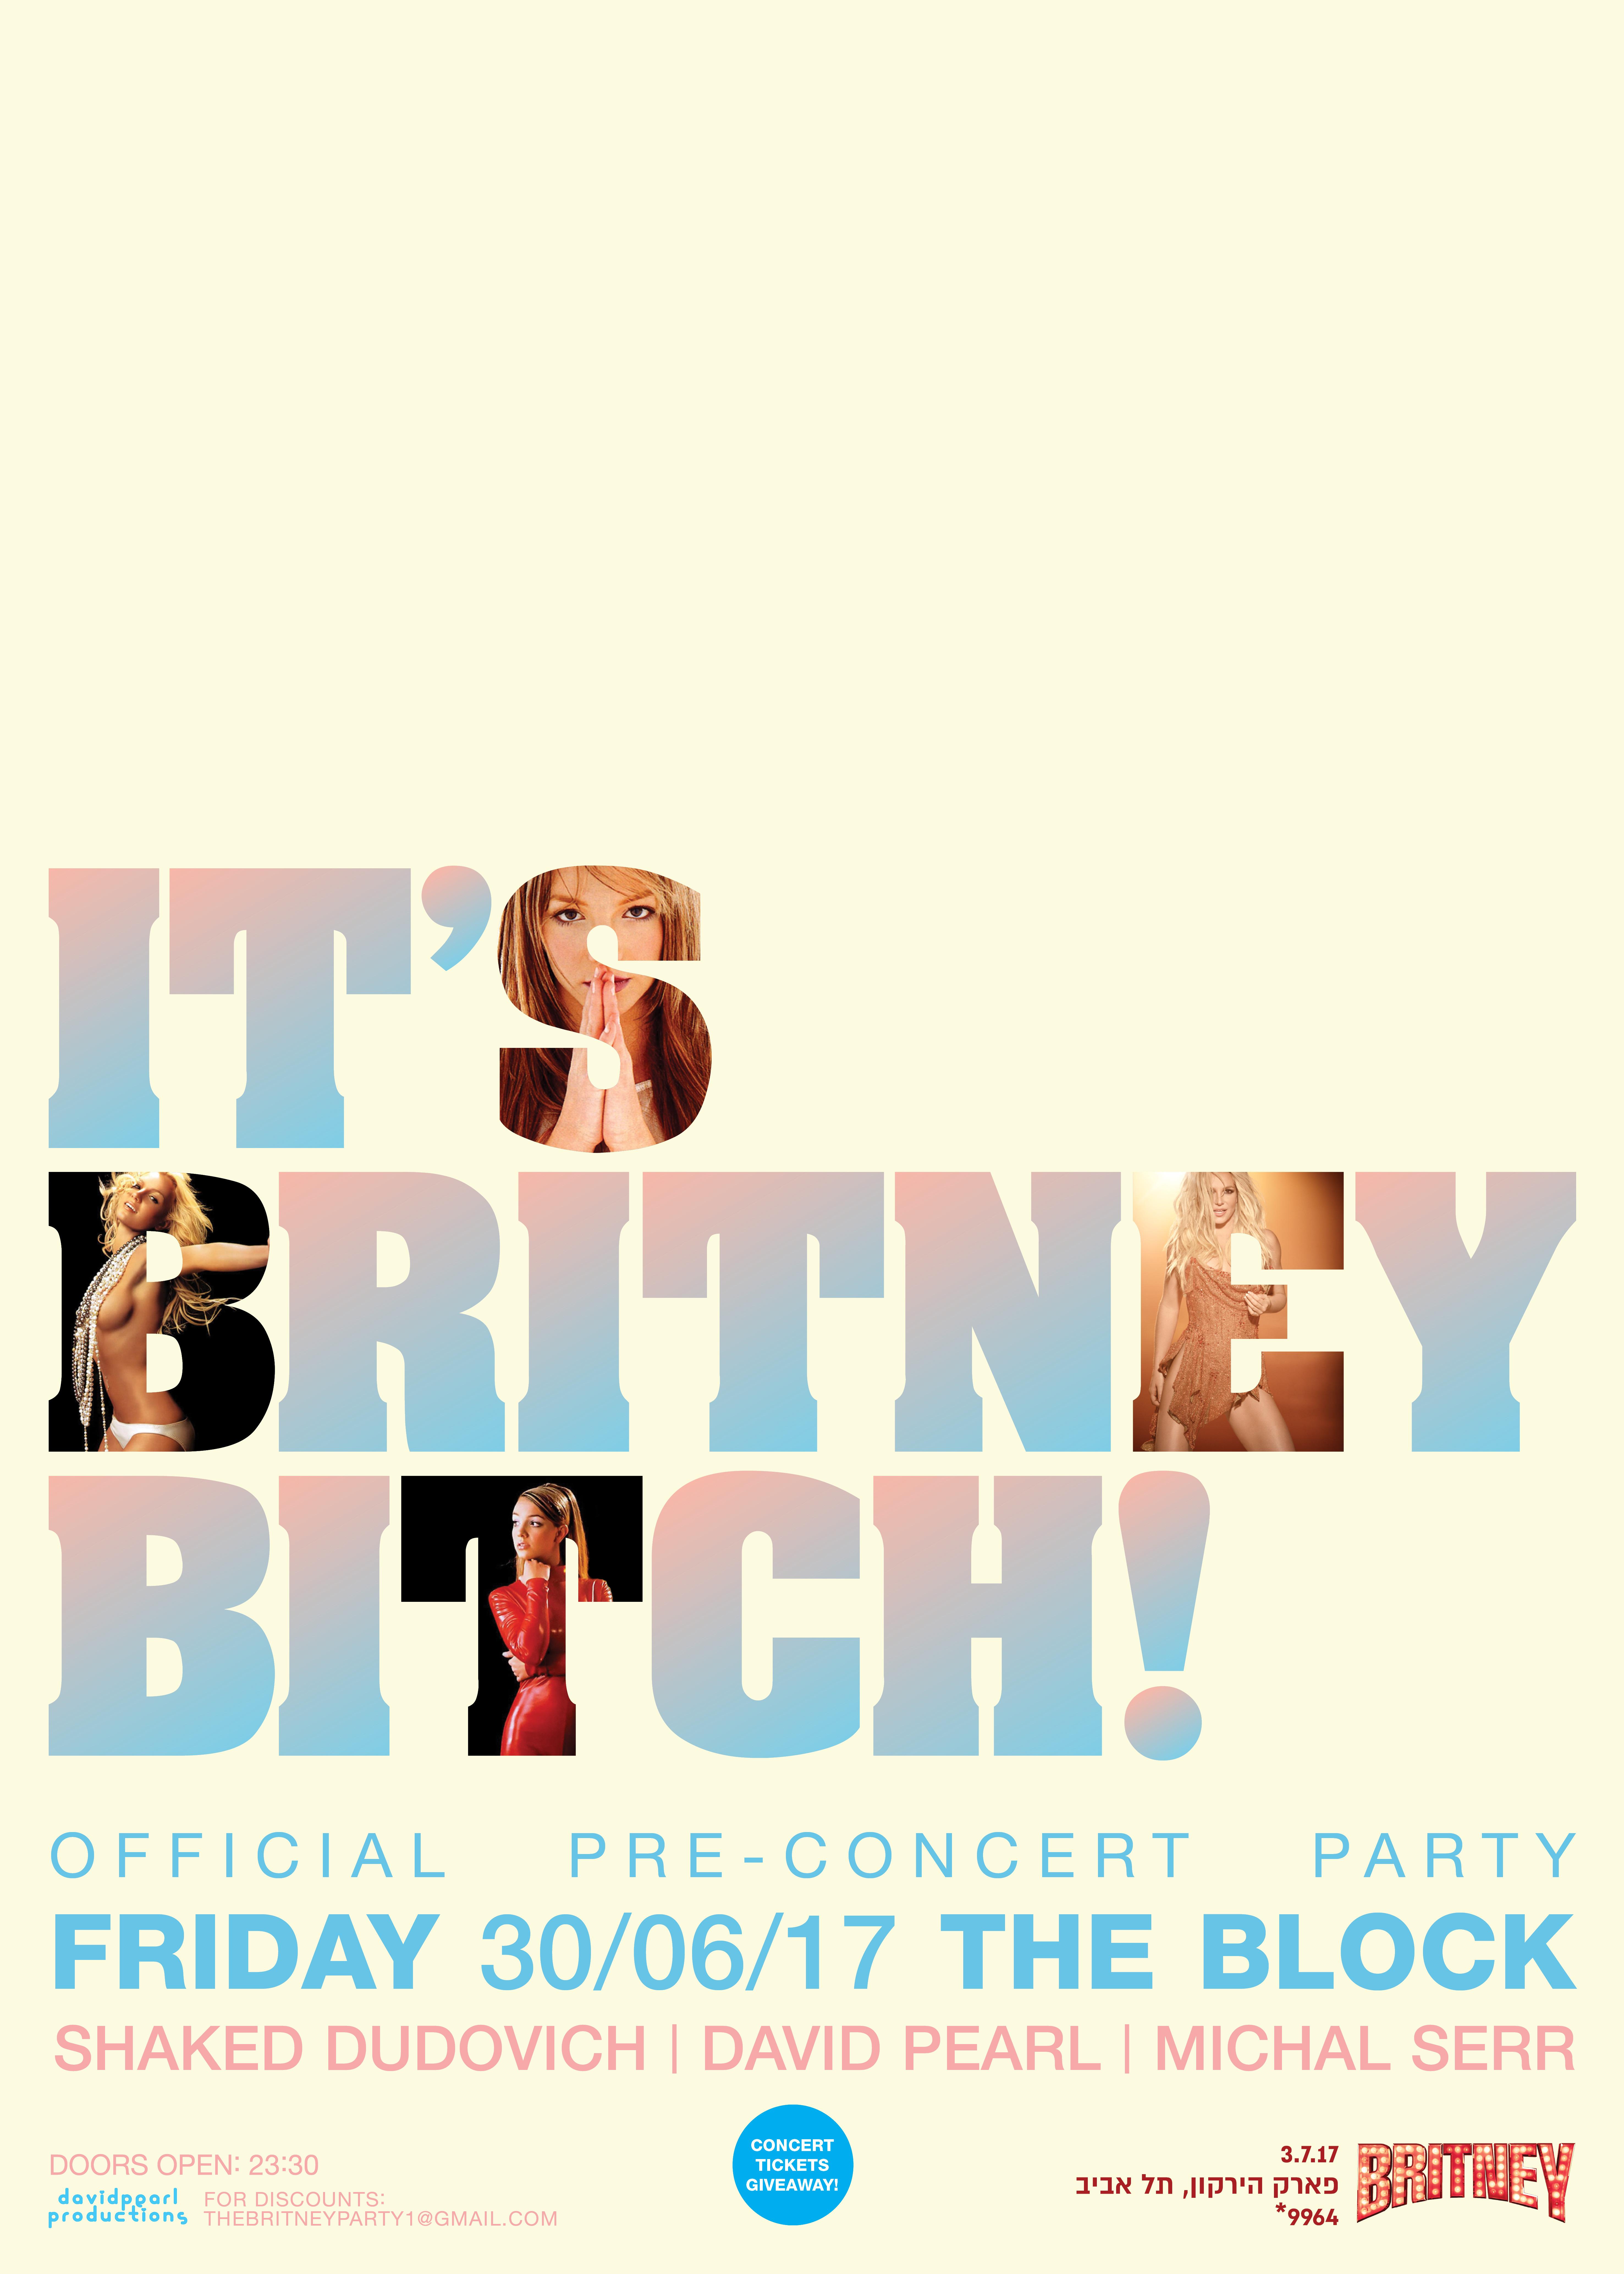 britney 30.06 poster1